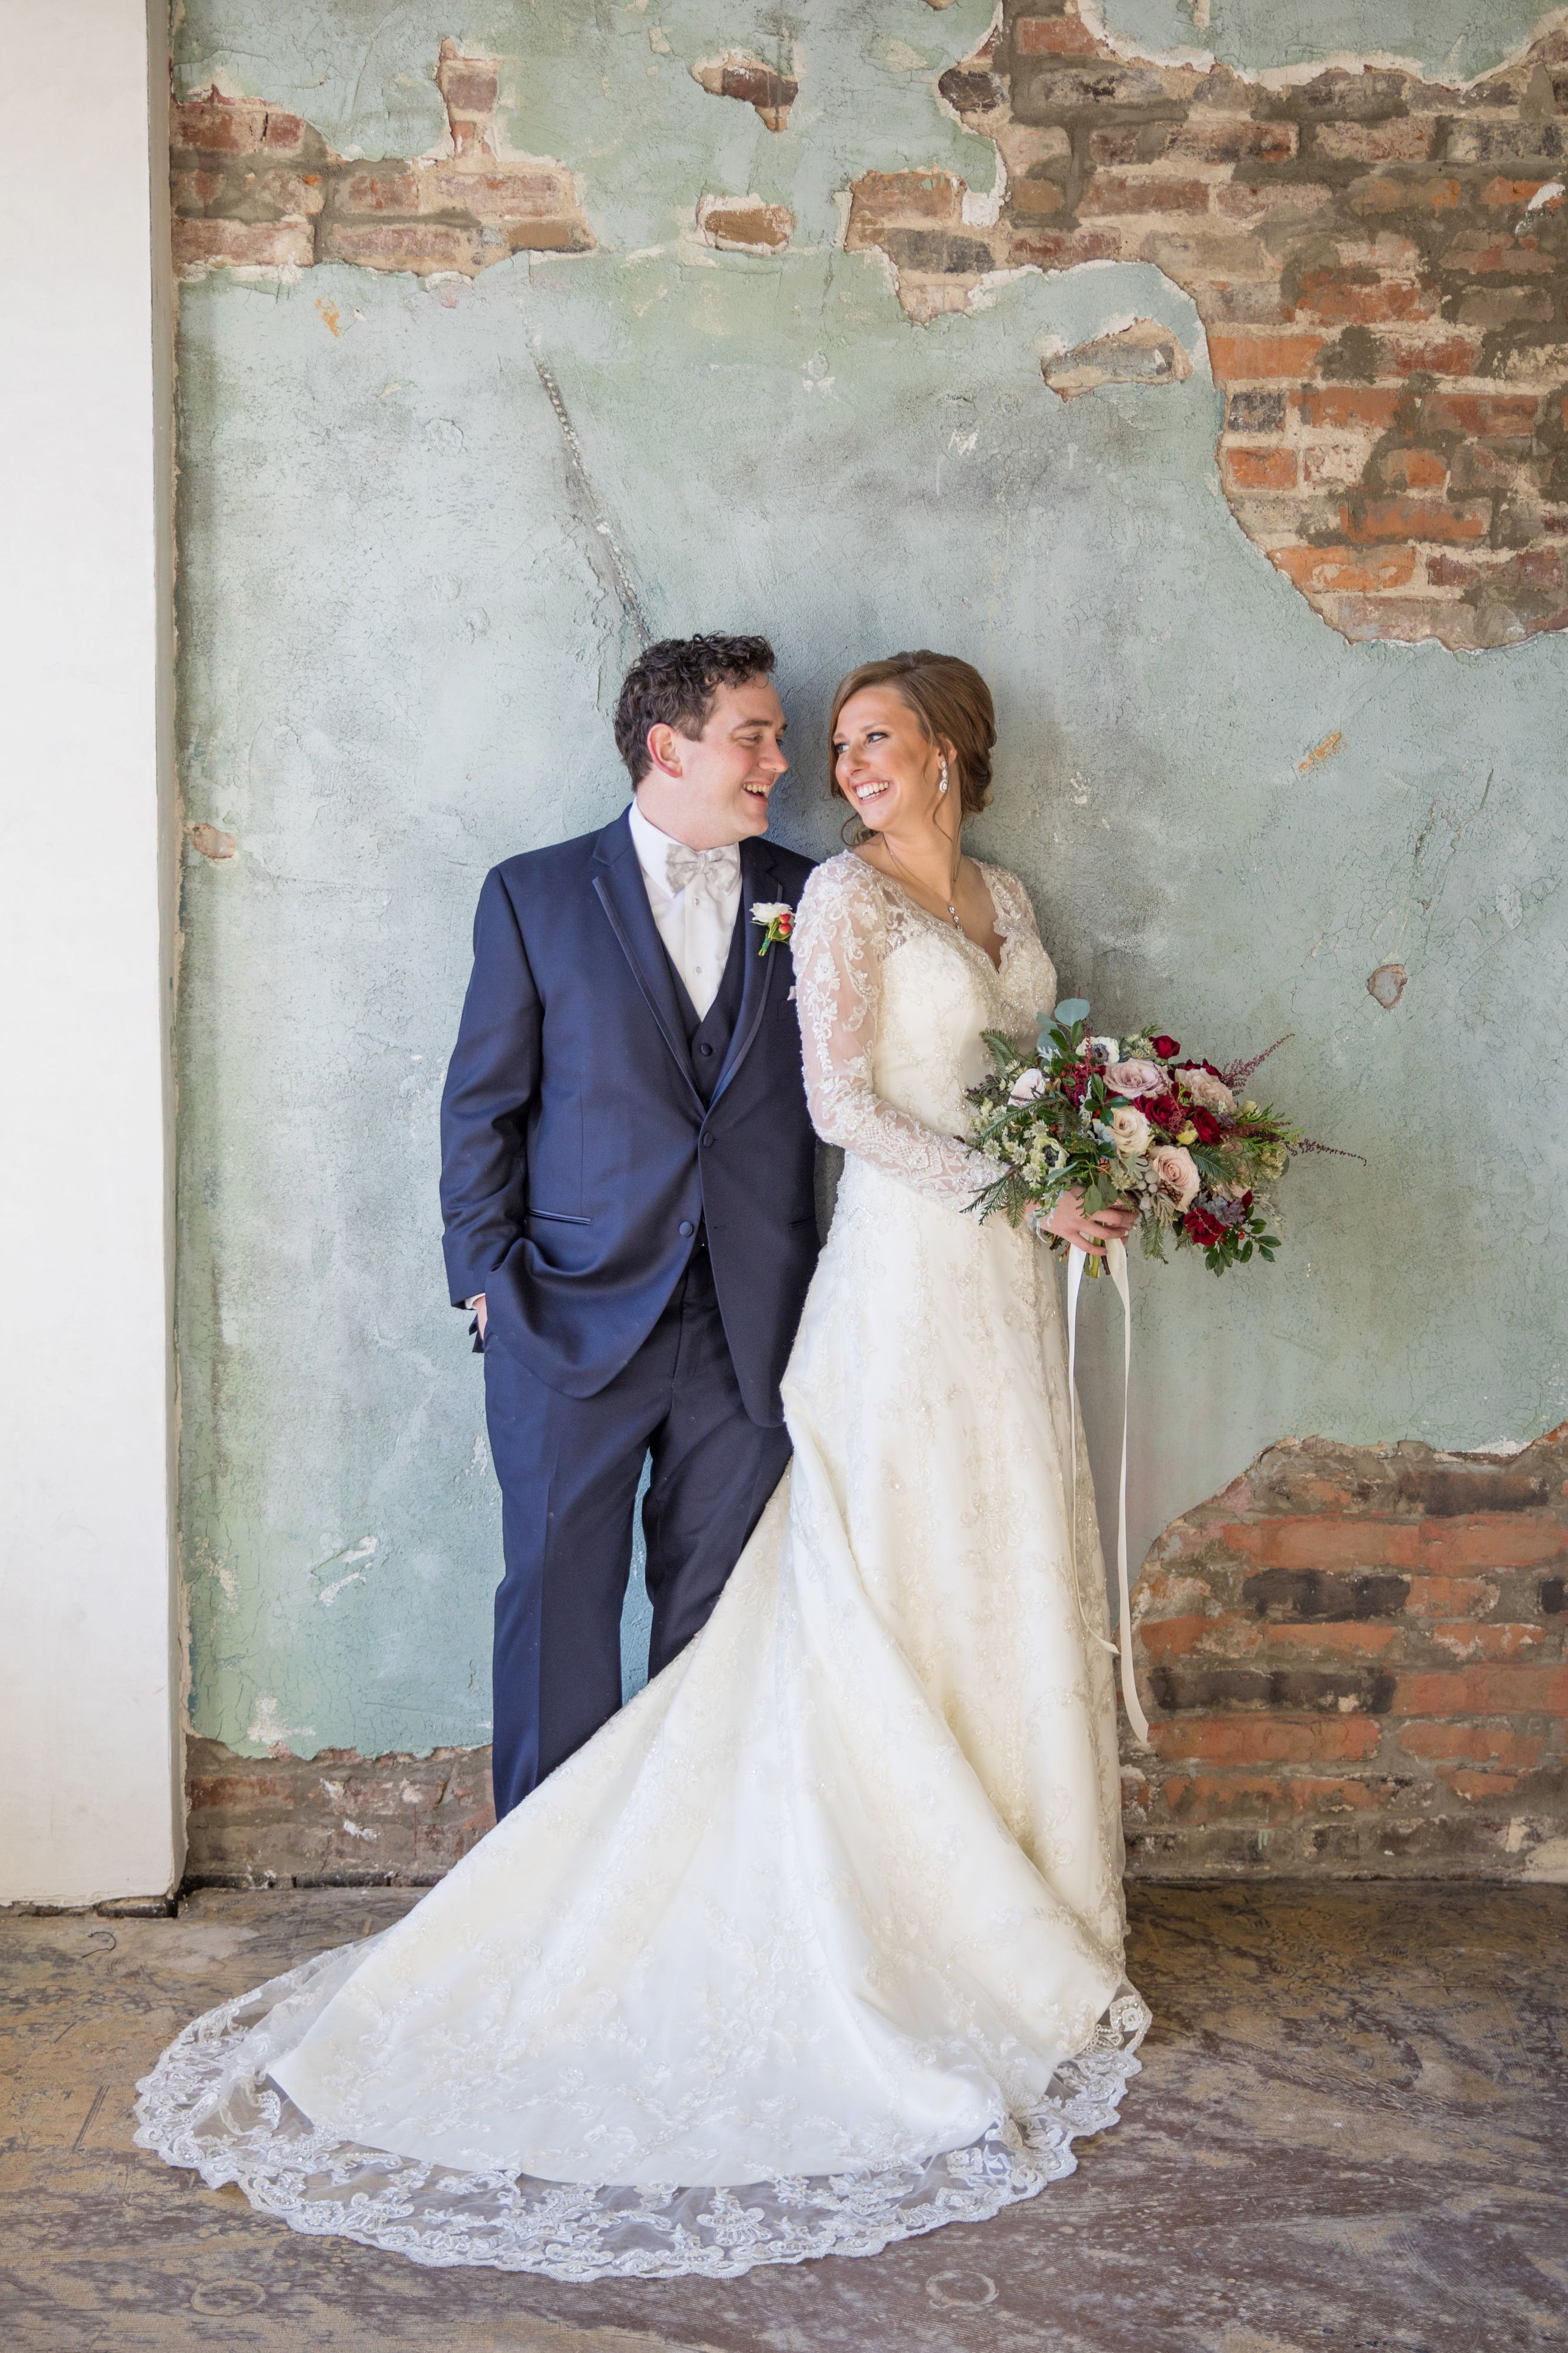 Build your own wedding dress  Casablanca Bridal Customized Wedding Dress  Style